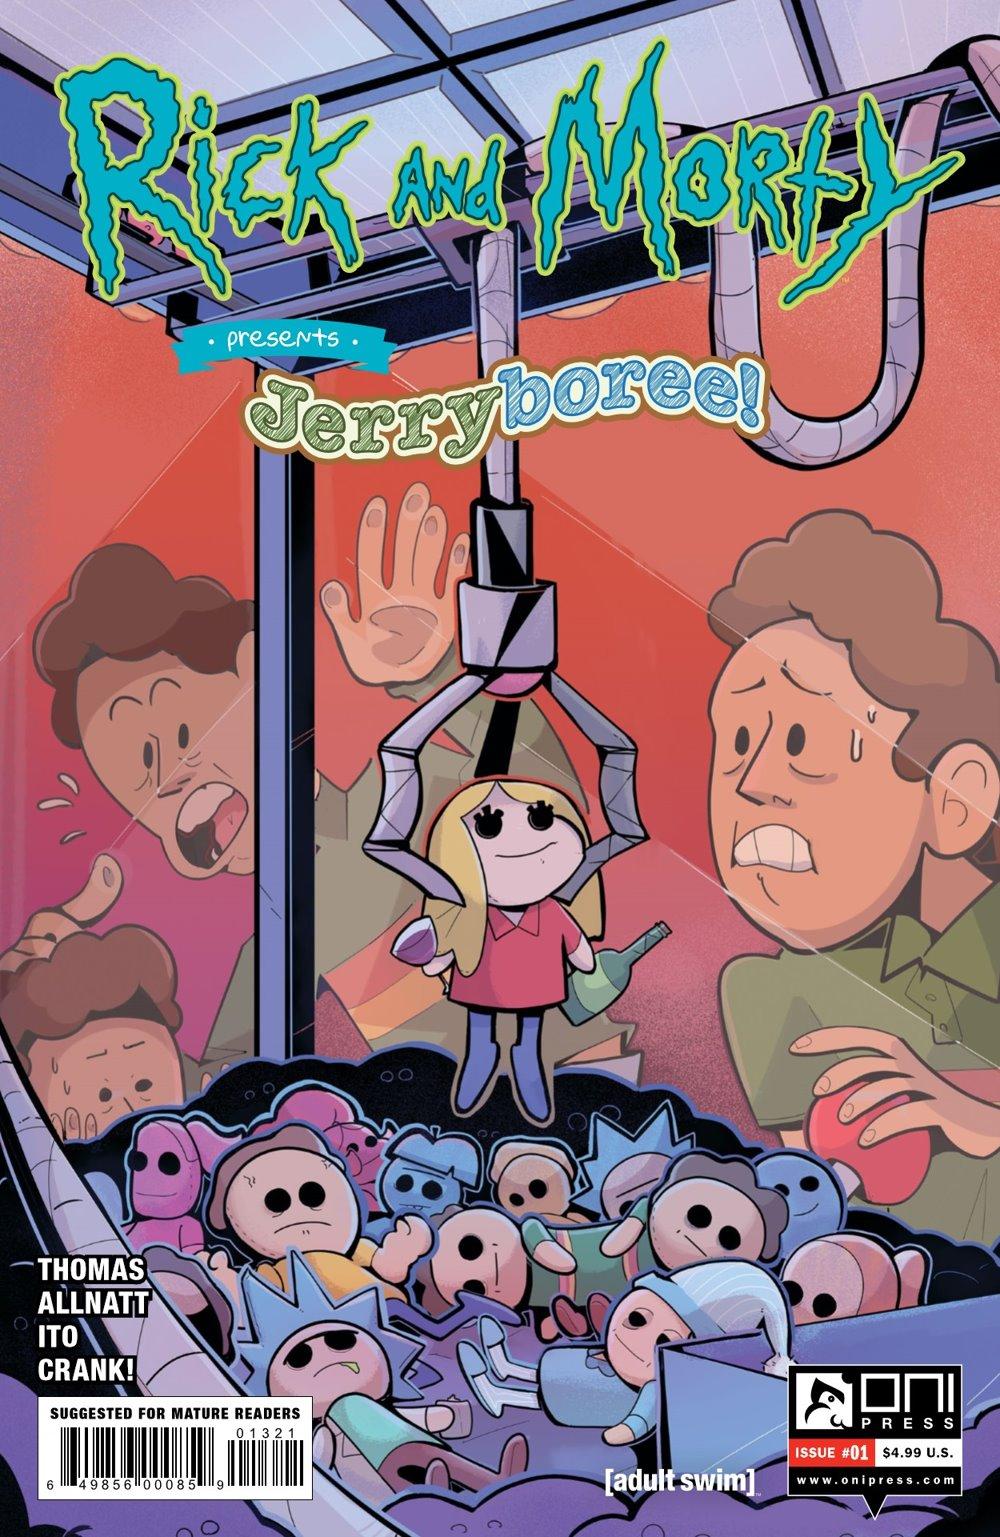 RM-PRES-JERRYBOREE-1-MARKETING-02 ComicList Previews: RICK AND MORTY PRESENTS JERRYBOREE #1